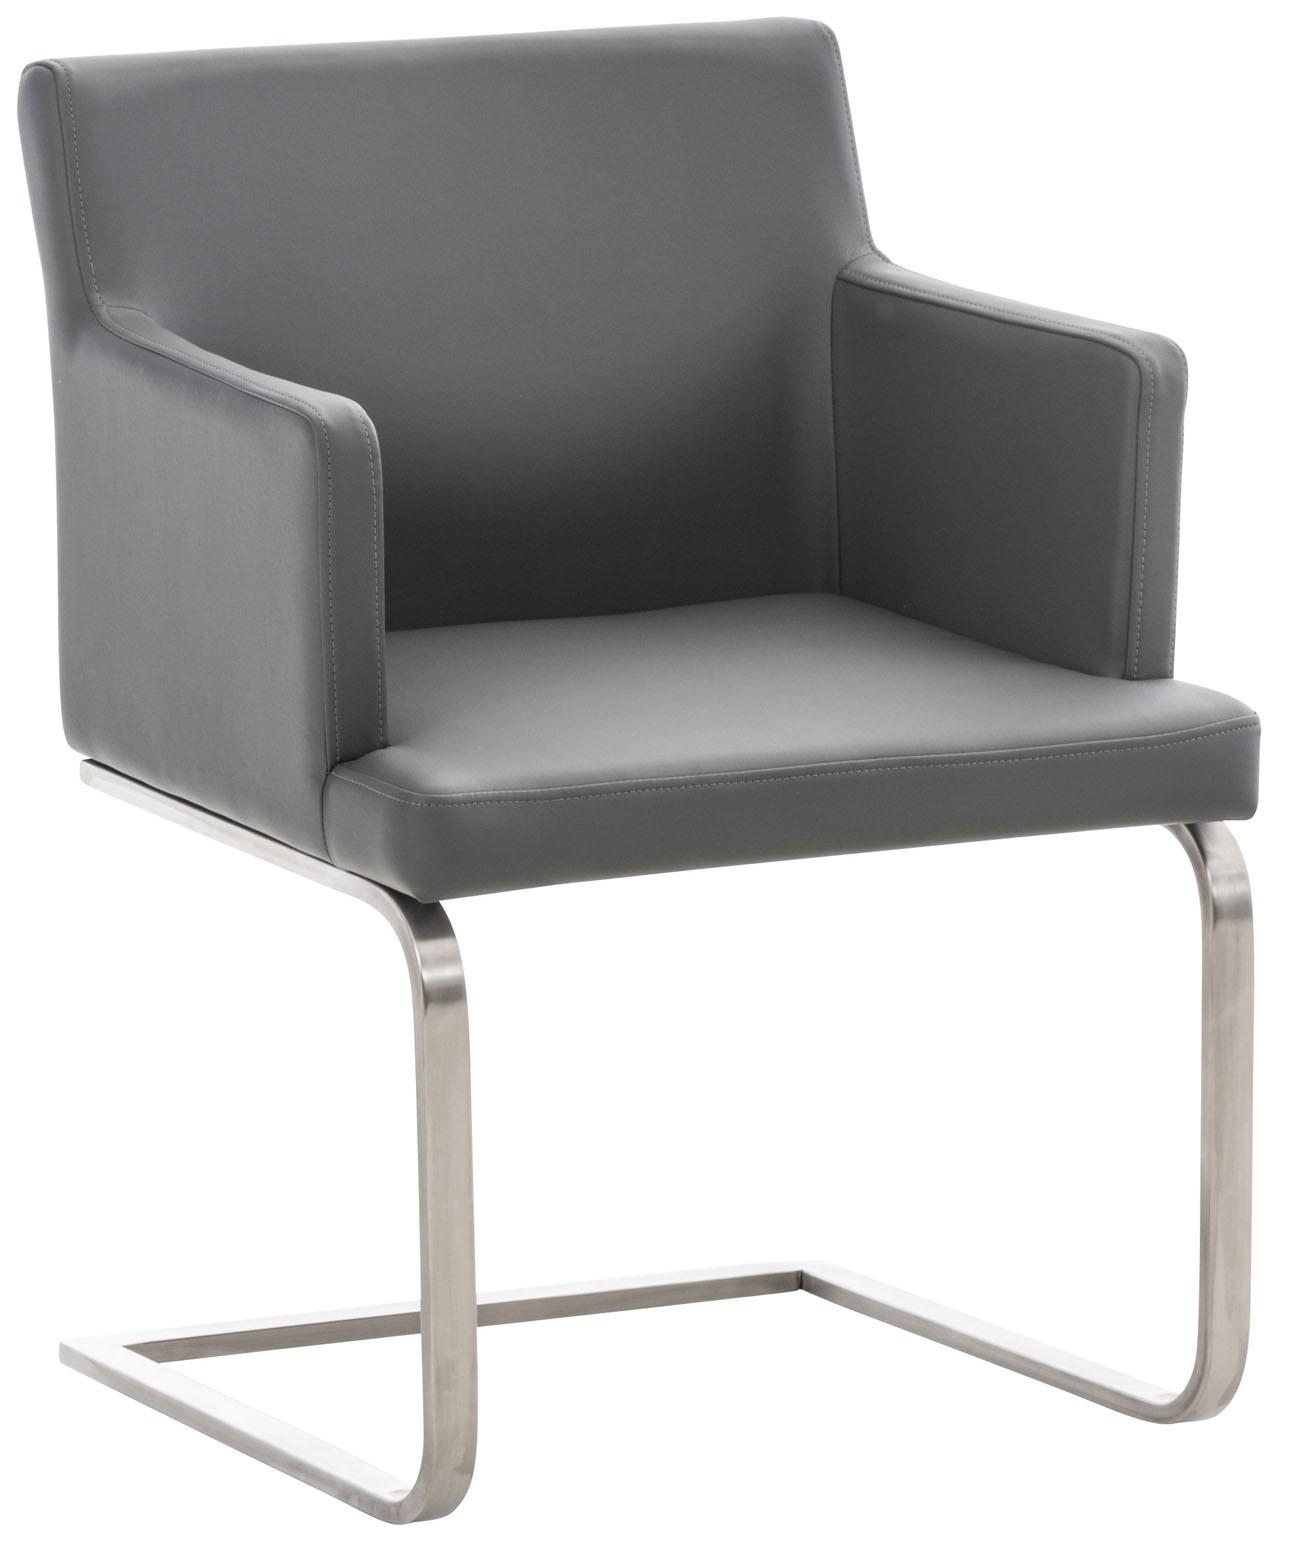 Chaise de salle à manger Aberford Similicuir